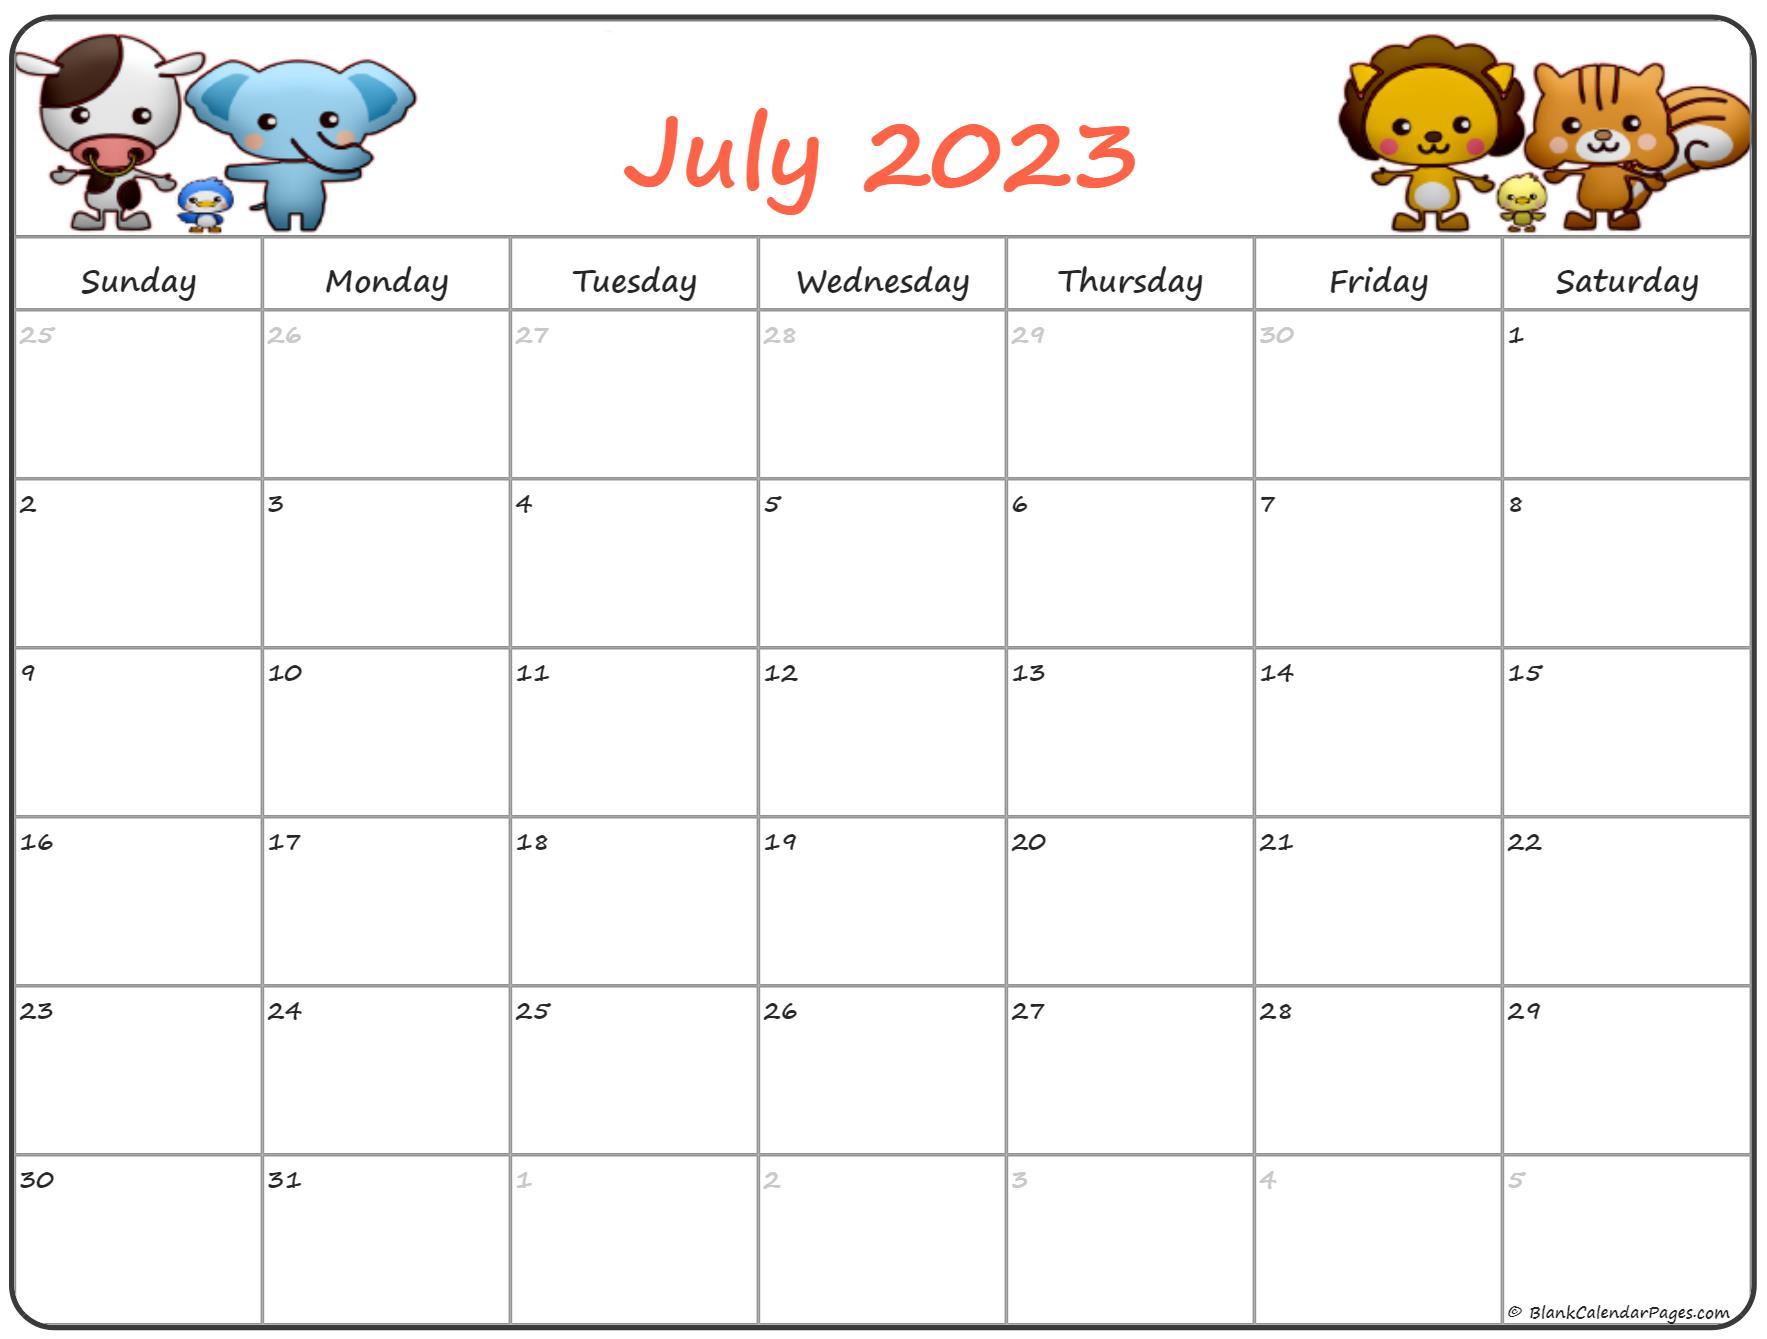 July 2022 Pregnancy Calendar | Fertility Calendar